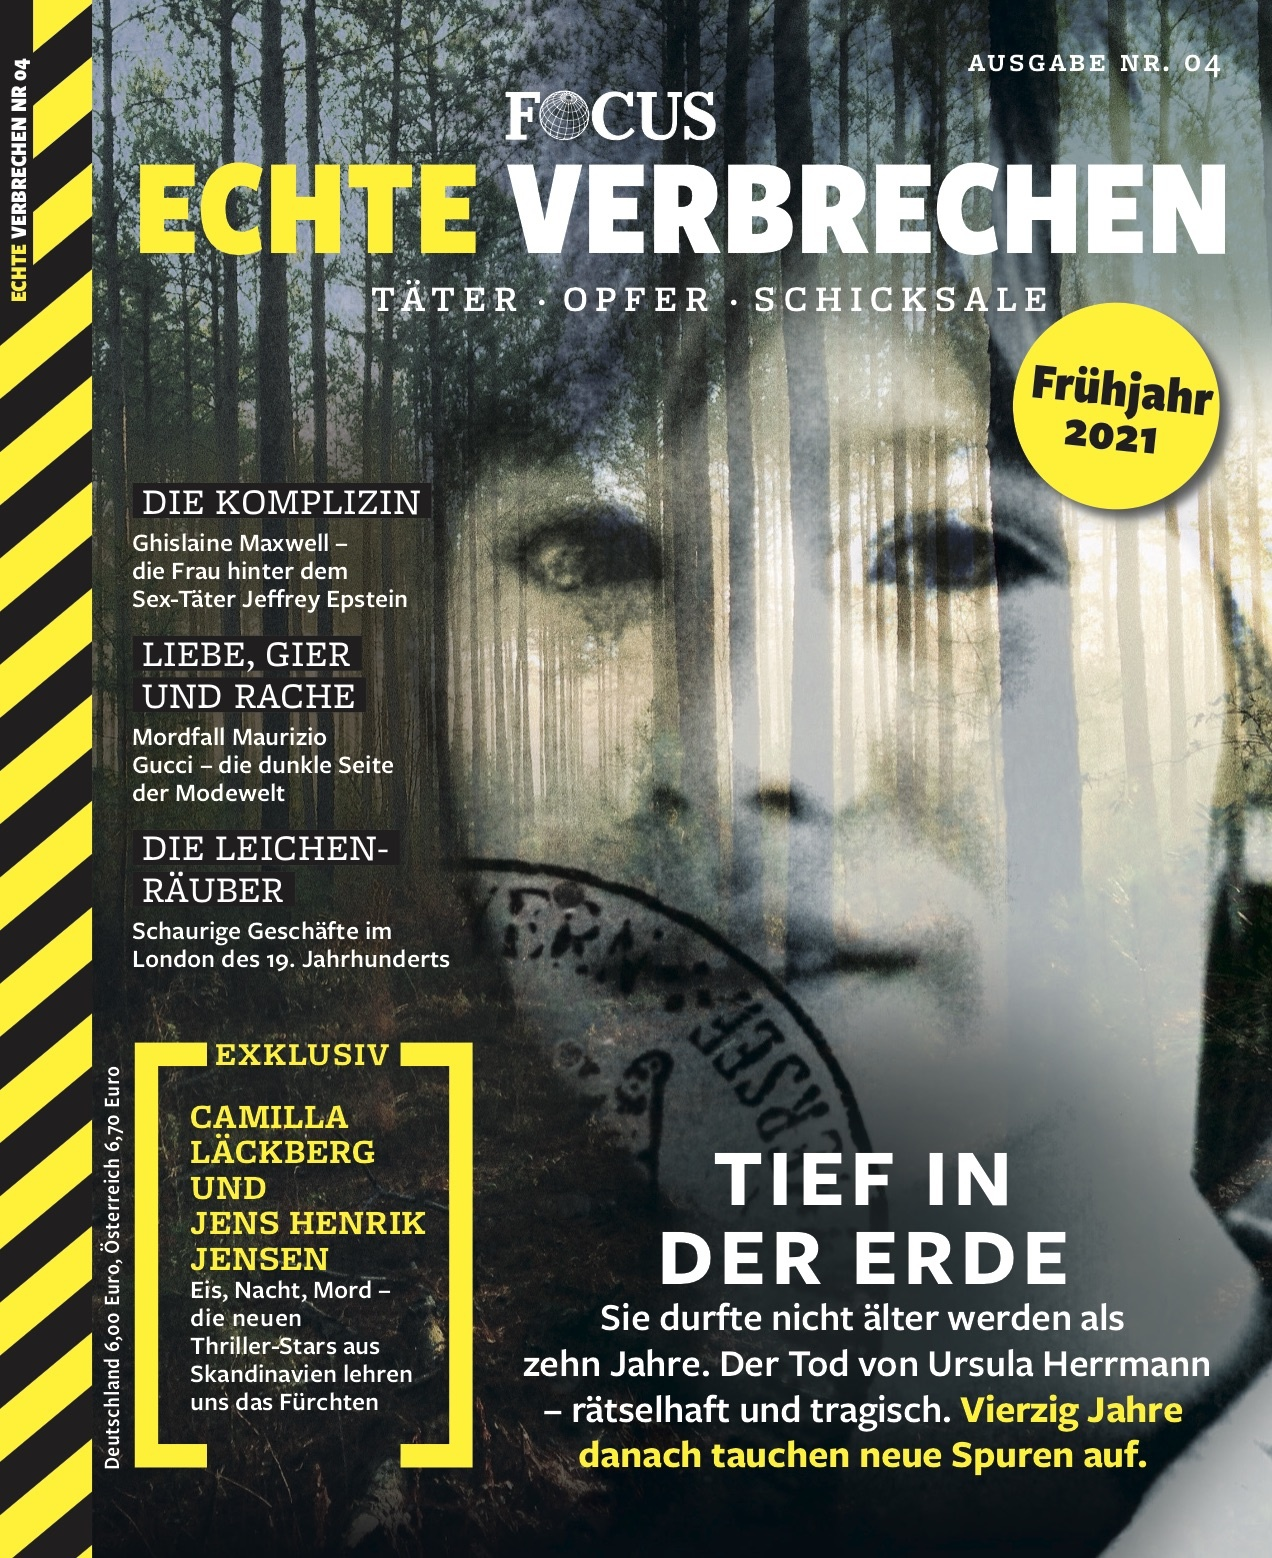 FOCUS Echte Verbrechen FOCUS Echte Verbrechen Nr. 04/2021